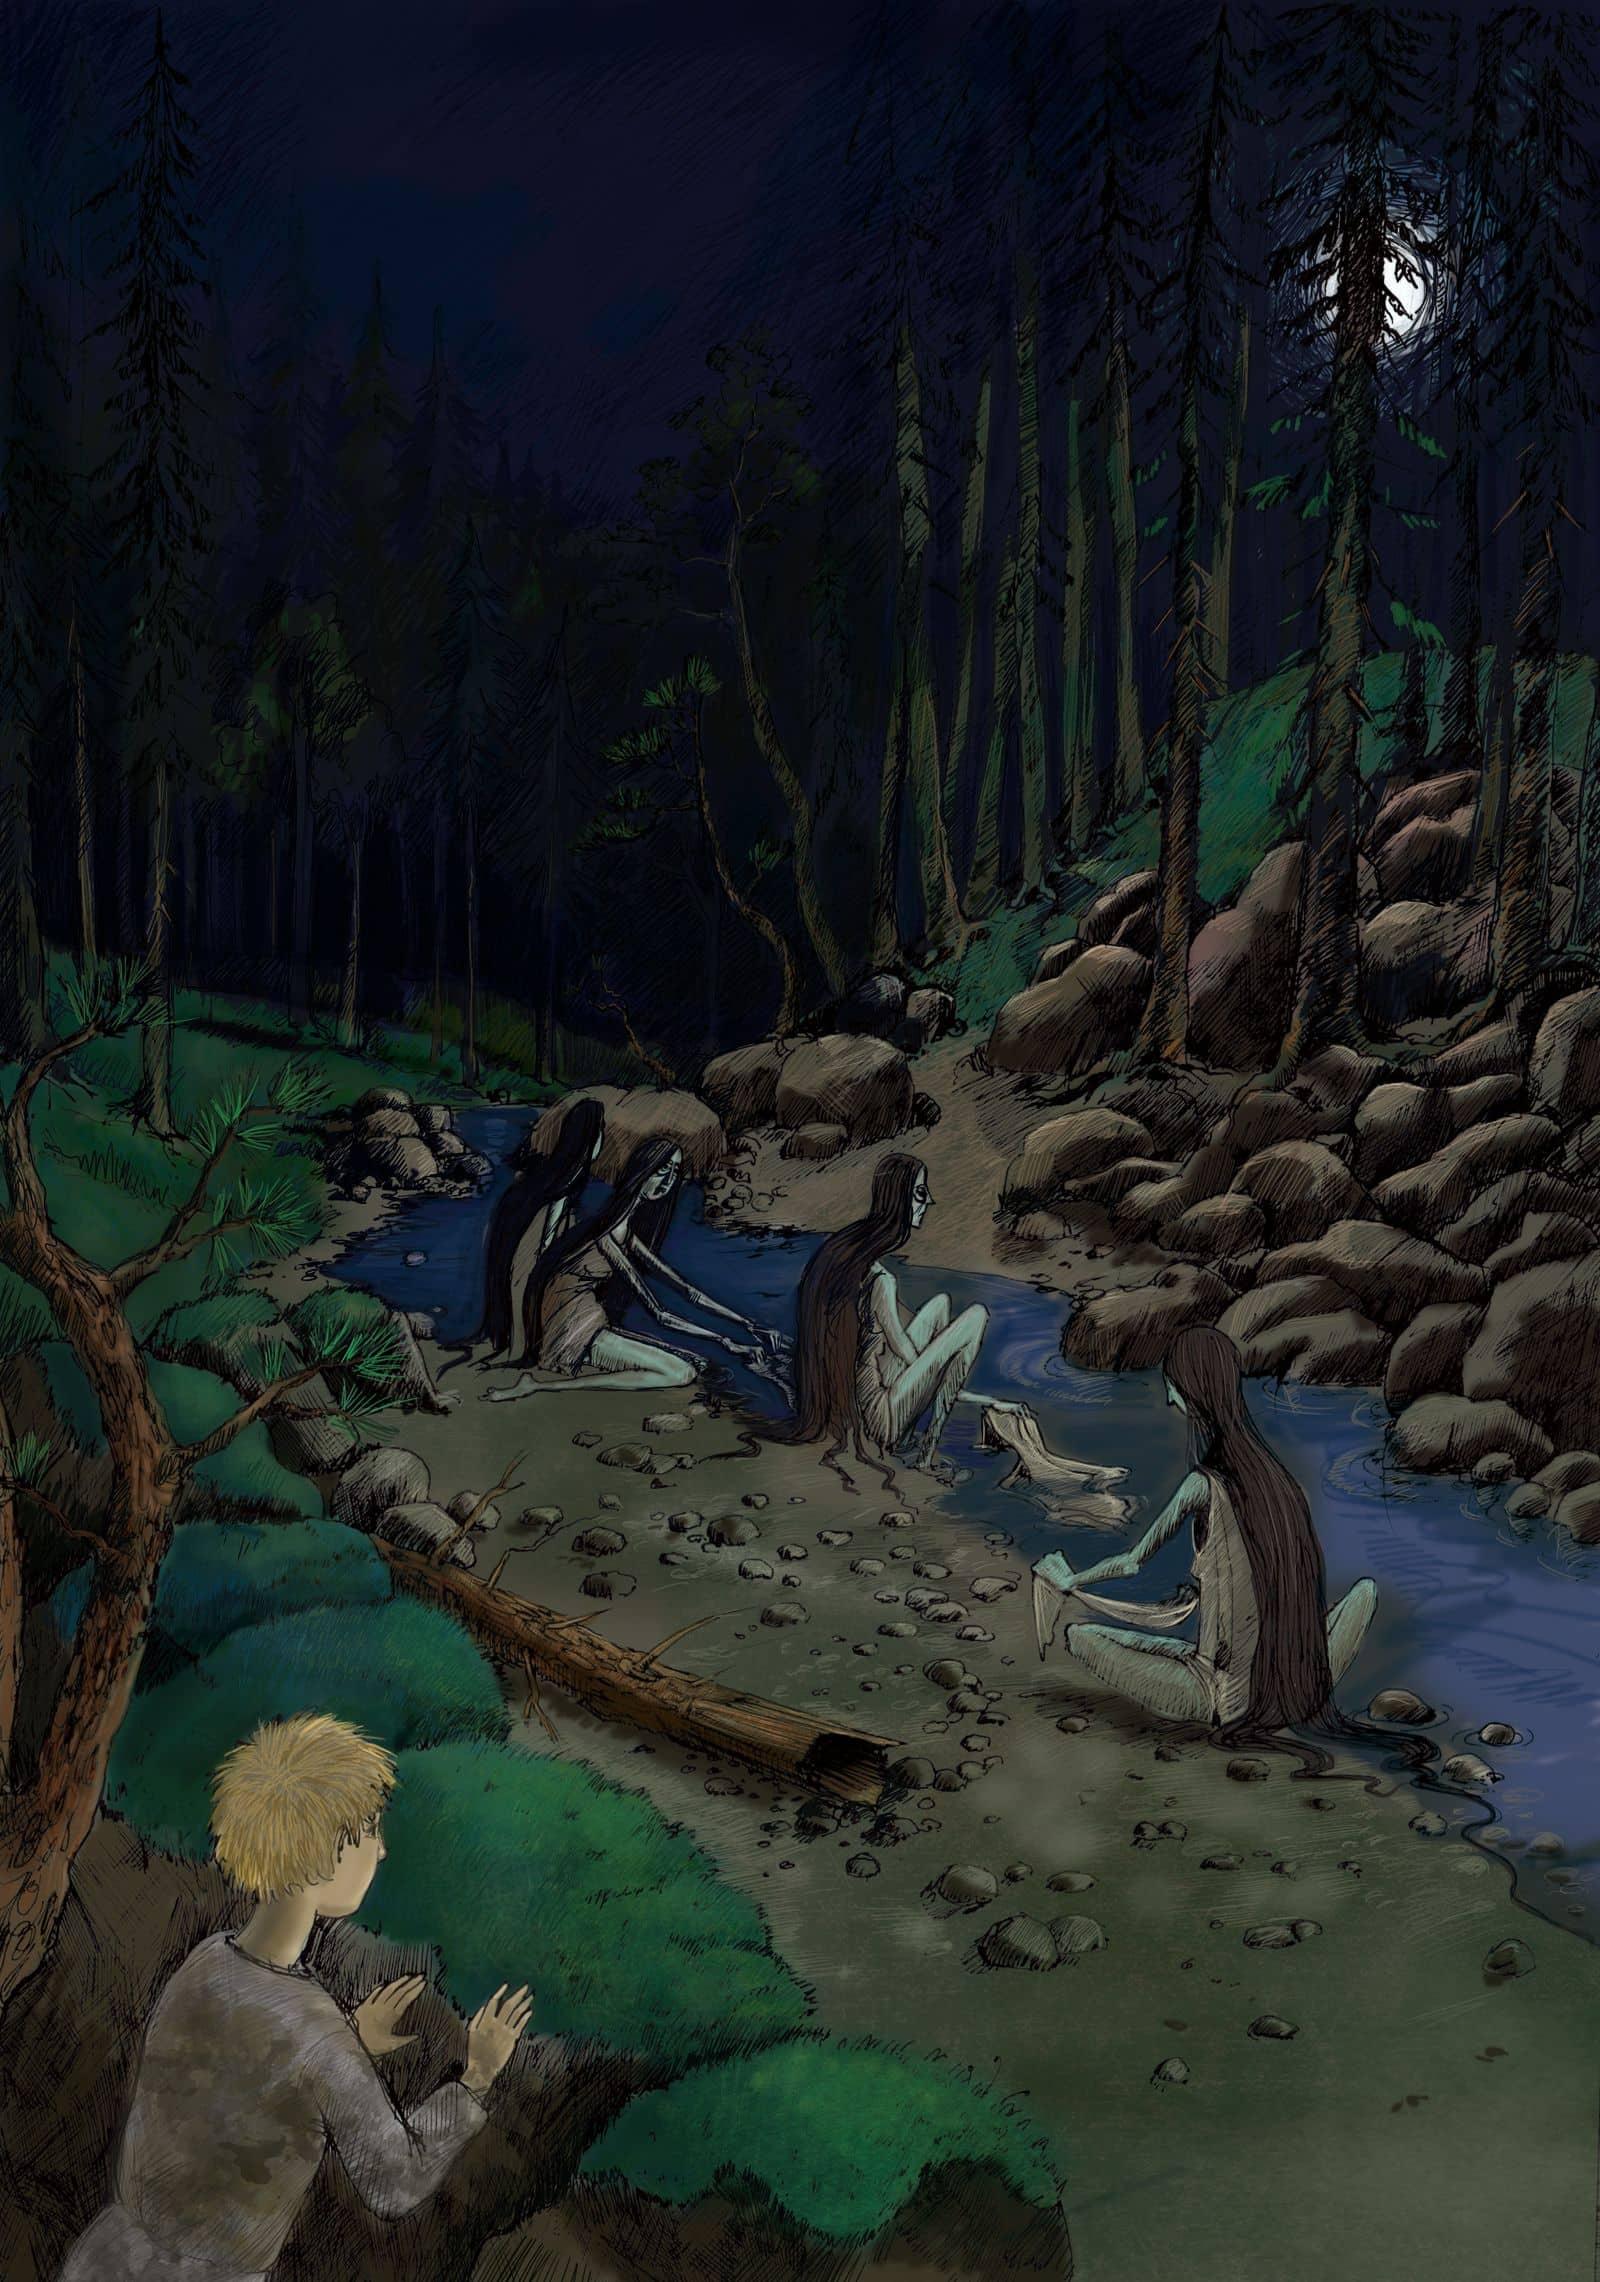 Noc między Tam i Tu - Marta Krajewska - mamuny nad brzegiem